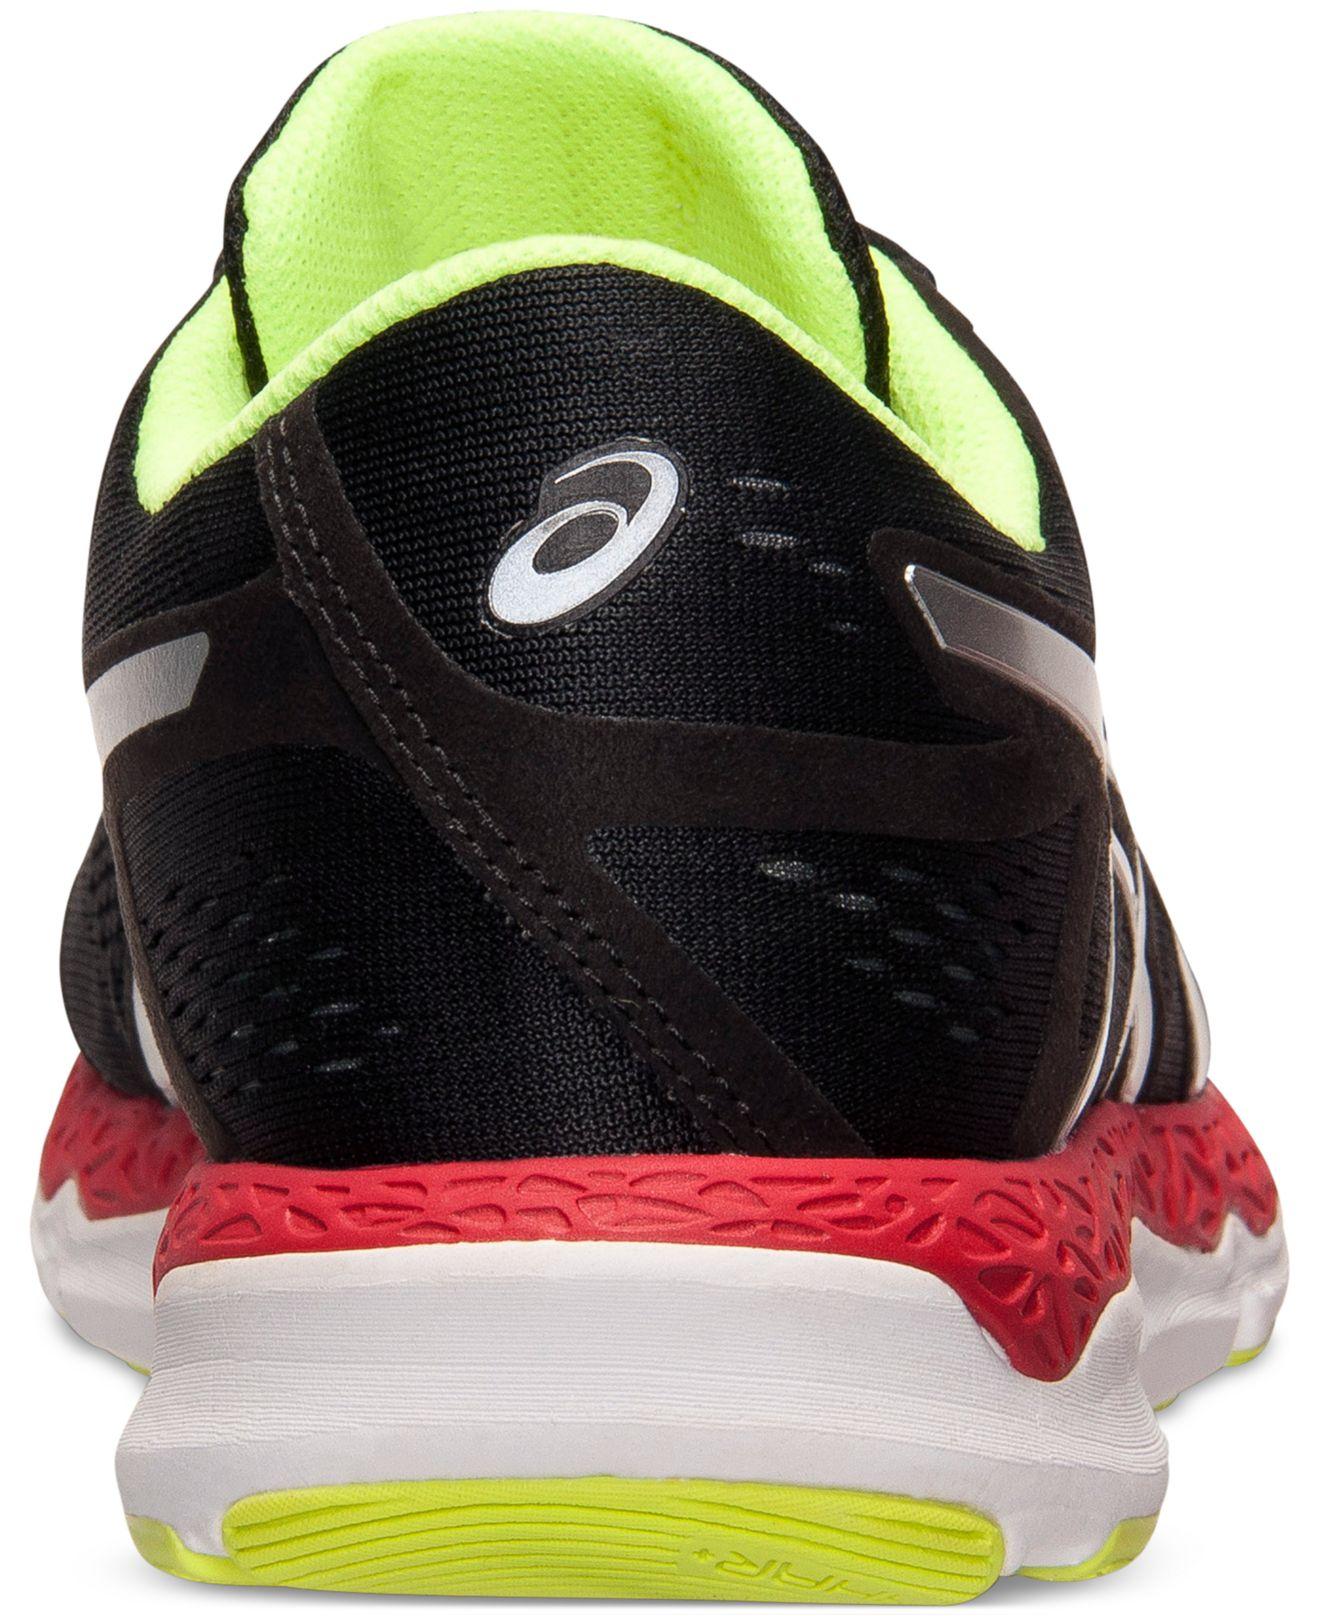 33 Asics Fa 18075 Running Sneakers de la S ligne d arrivée en noir de Lyst Asics Men S ebdb688 - trumpfacts.website